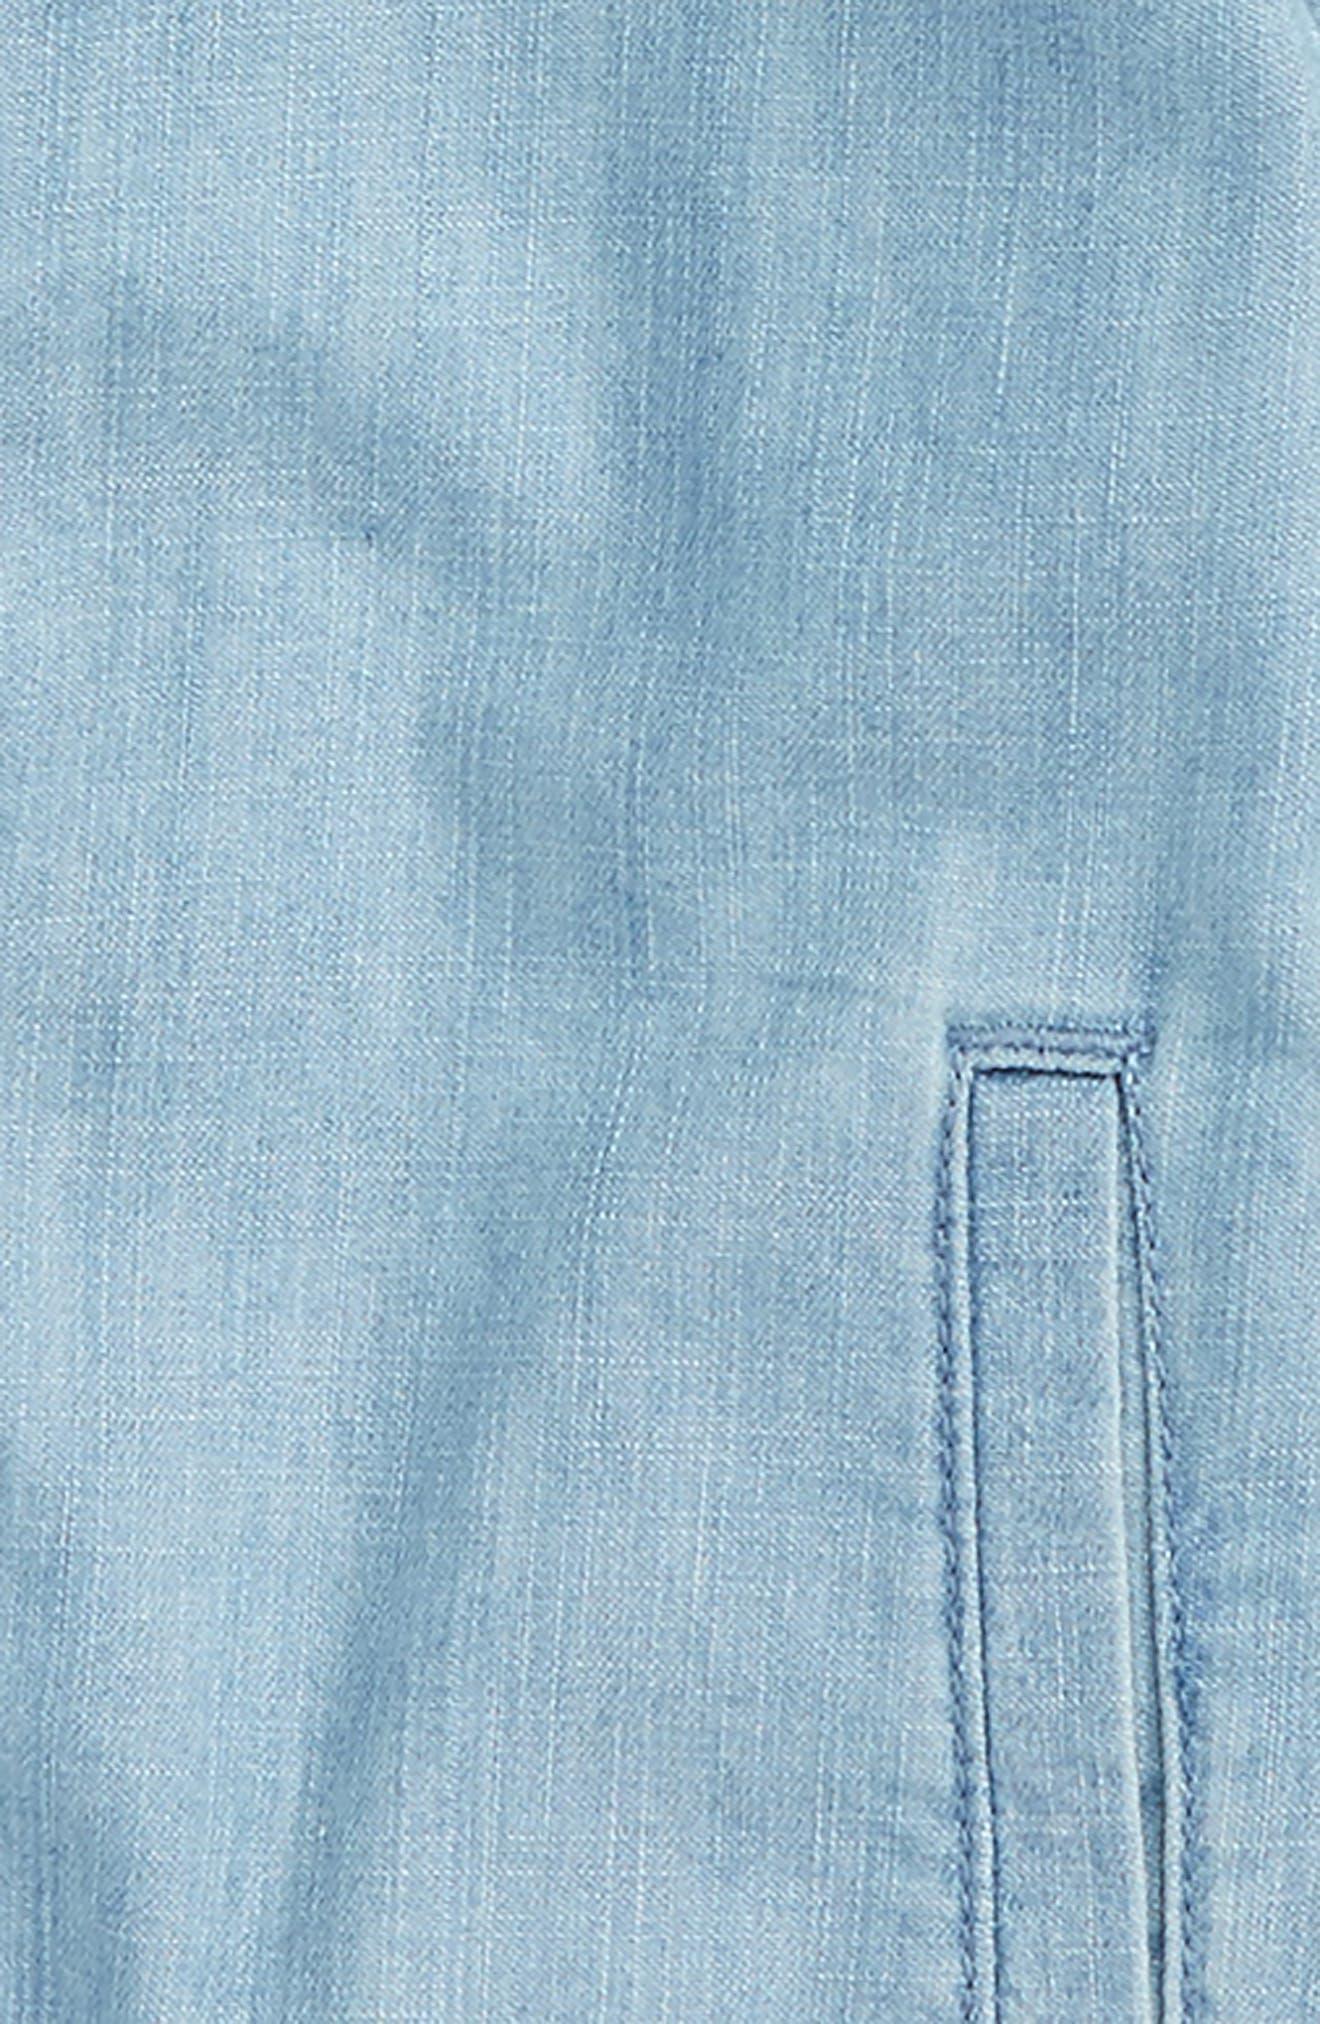 Denim Bomber Jacket,                             Alternate thumbnail 2, color,                             Bluebird Wash